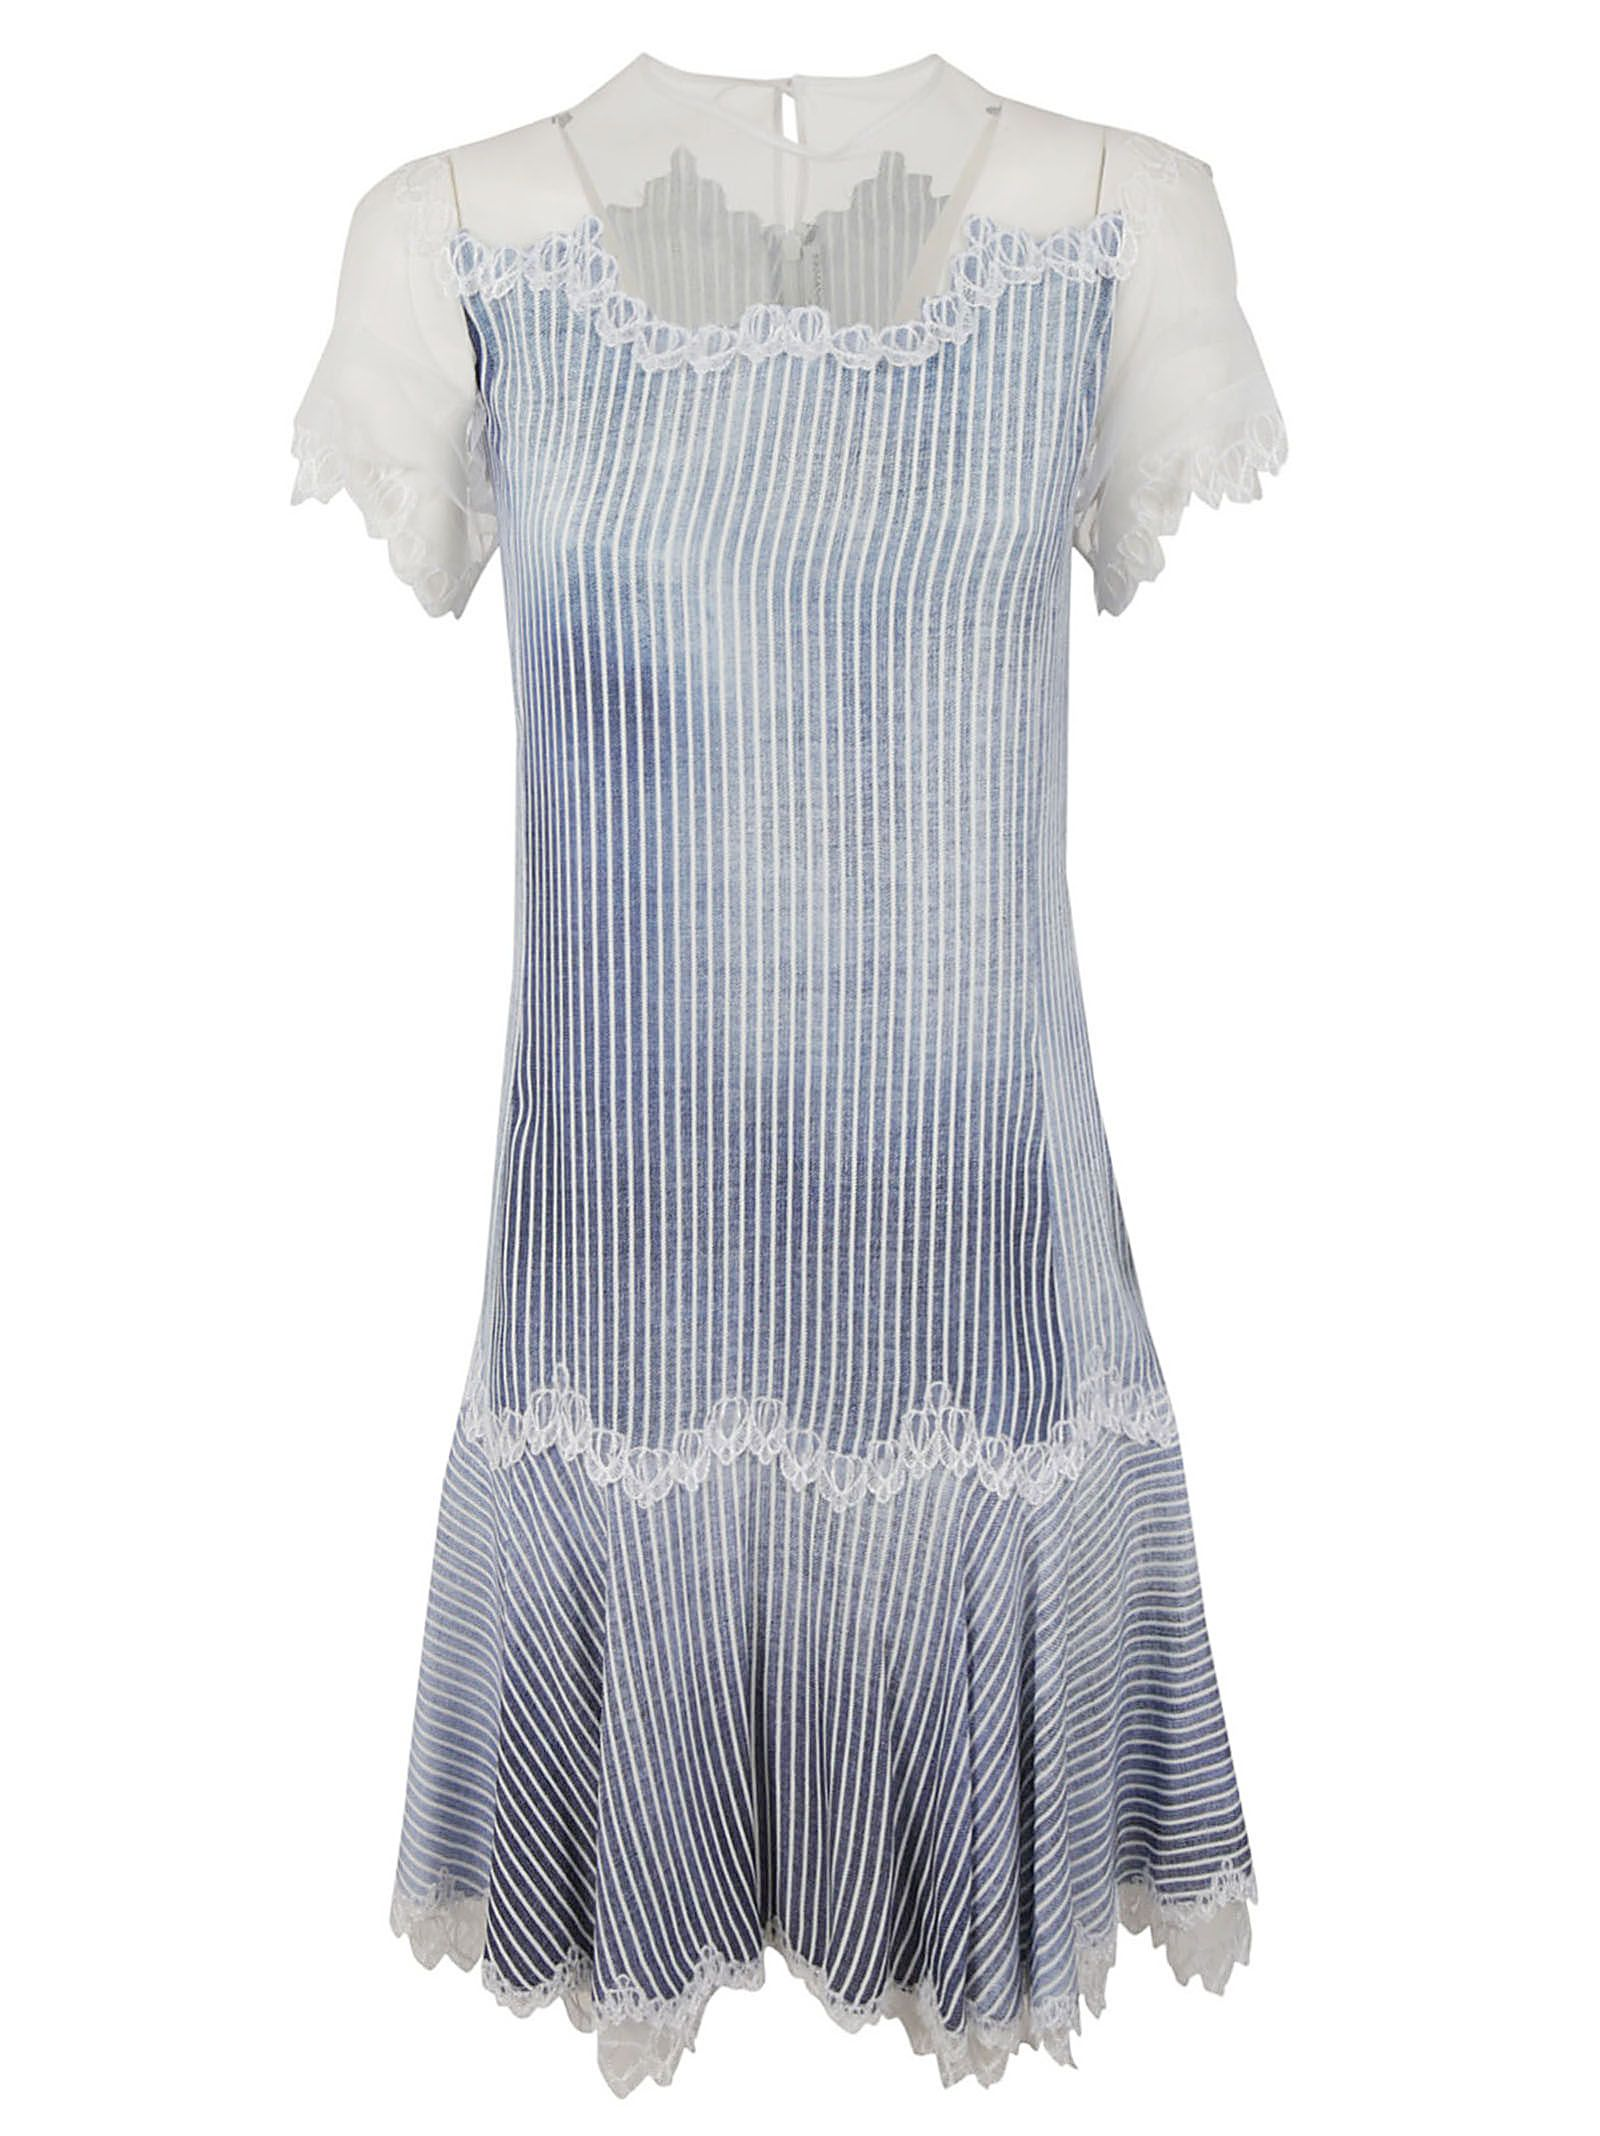 c0679566bc03 Ermanno Scervino Ermanno Scervino Lace Detail Striped Dress - Basic ...